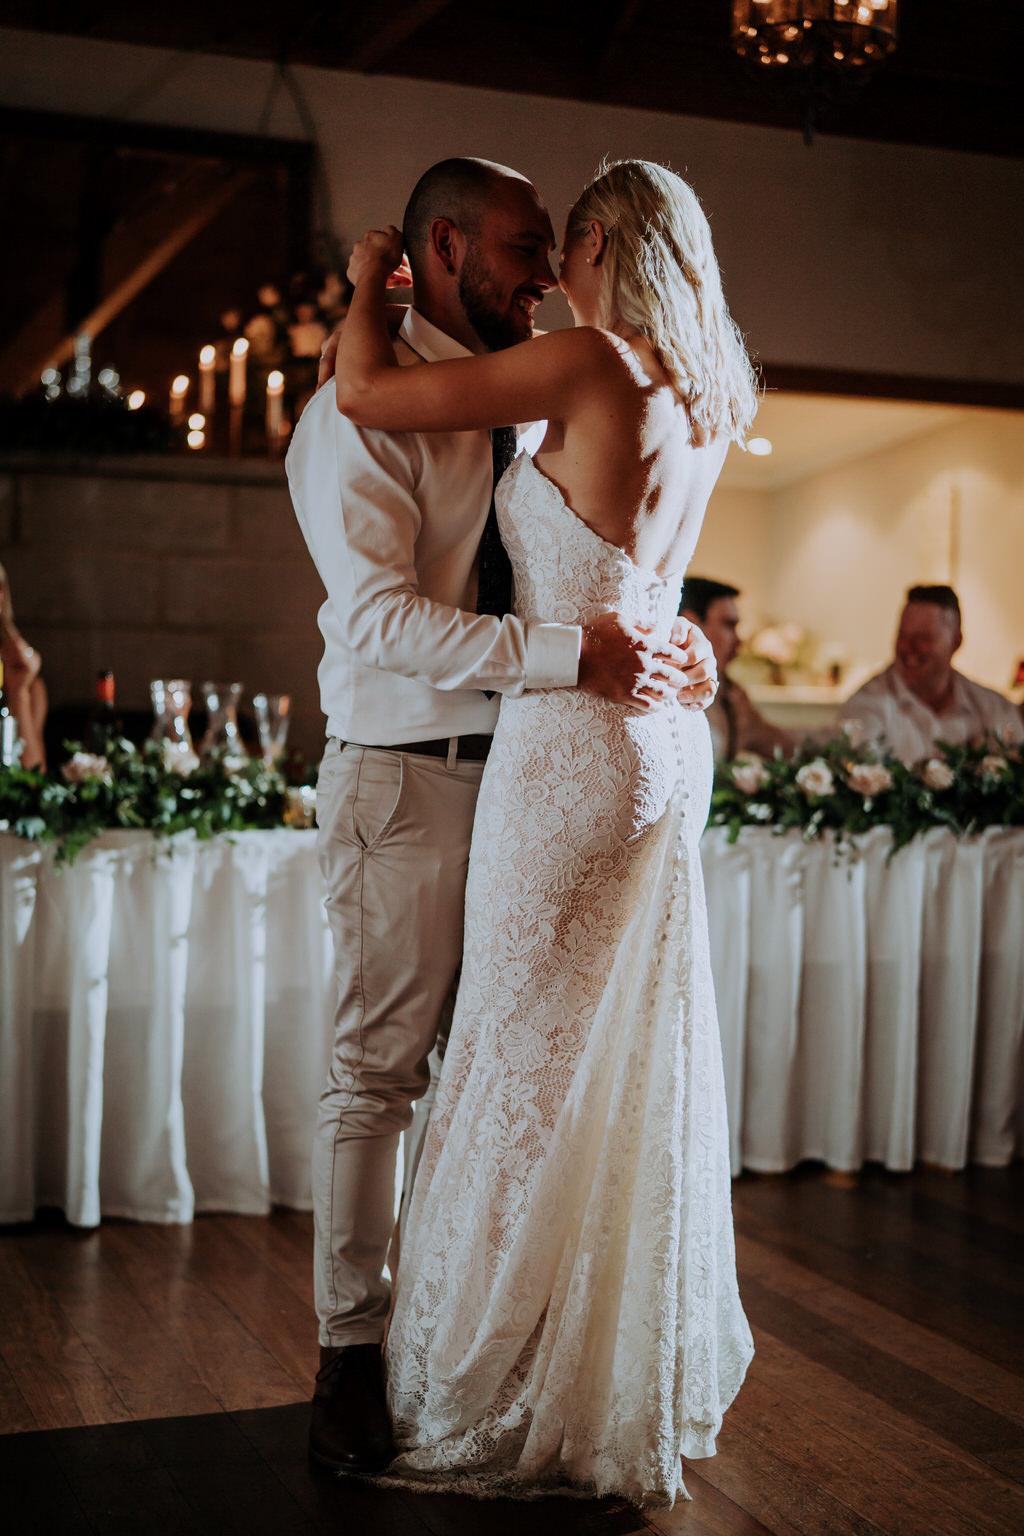 ava-me-photography-jade-simon-loxley-bellbird-hill-kurrajong-heights-wedding-978